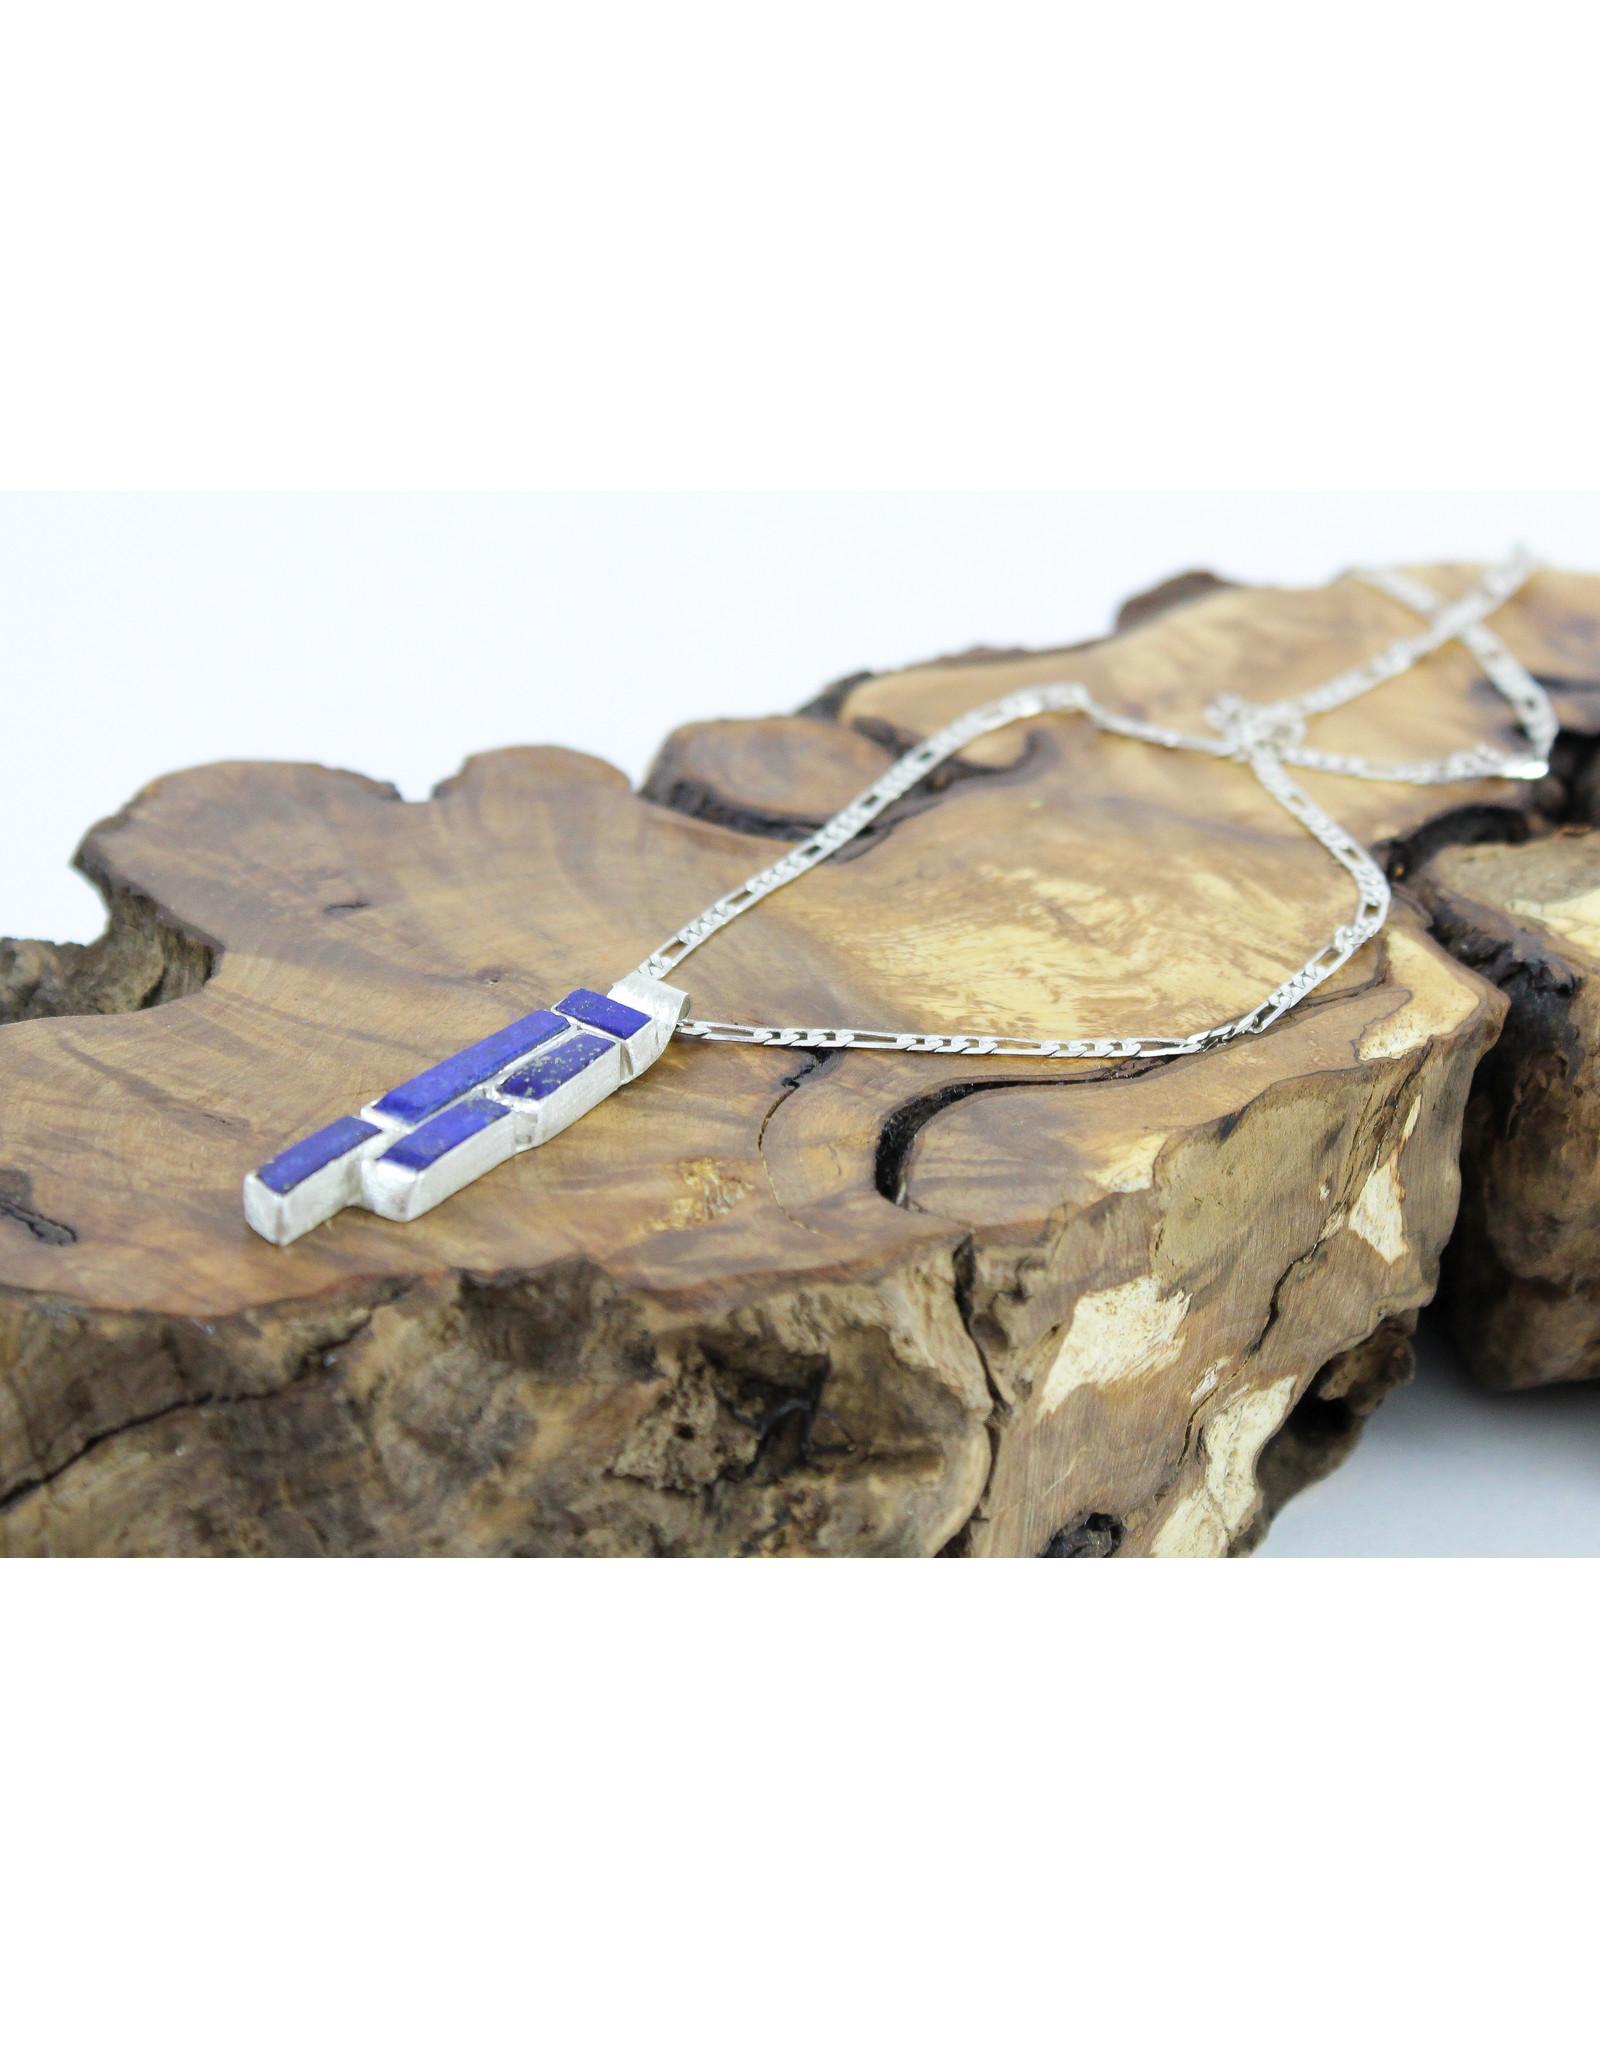 Teddy Tedford Lapis Lazuli Pendant Necklace by Teddy Tedford